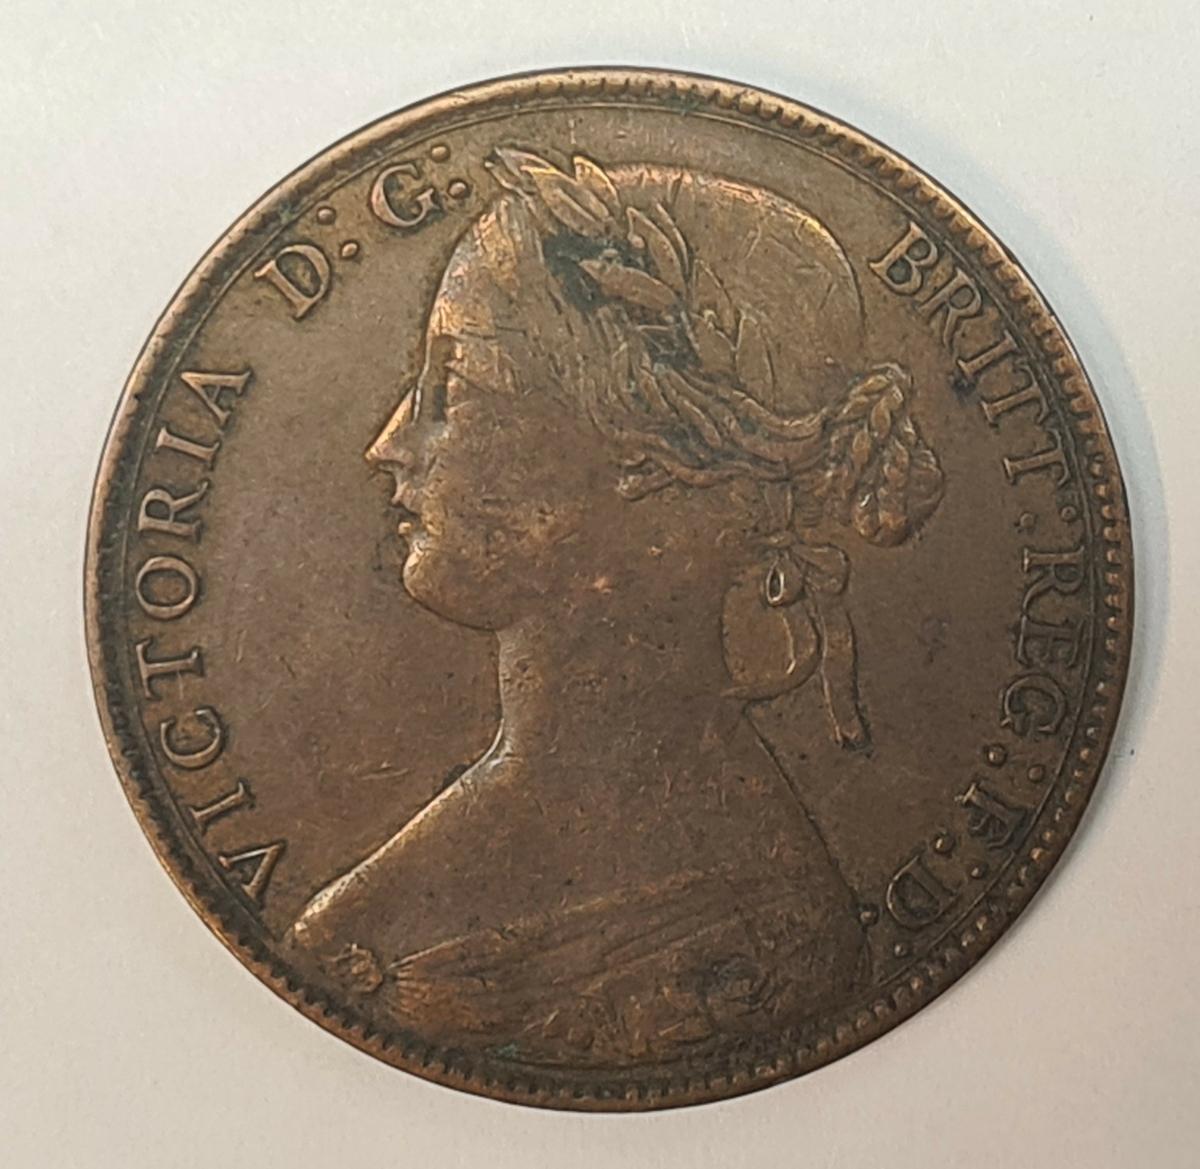 5 mynt från Storbritanien. 1 Penny, 1860 1 Penny, 1861 1 Penny, 1862 1 Penny, 1876 1 Penny, 1889